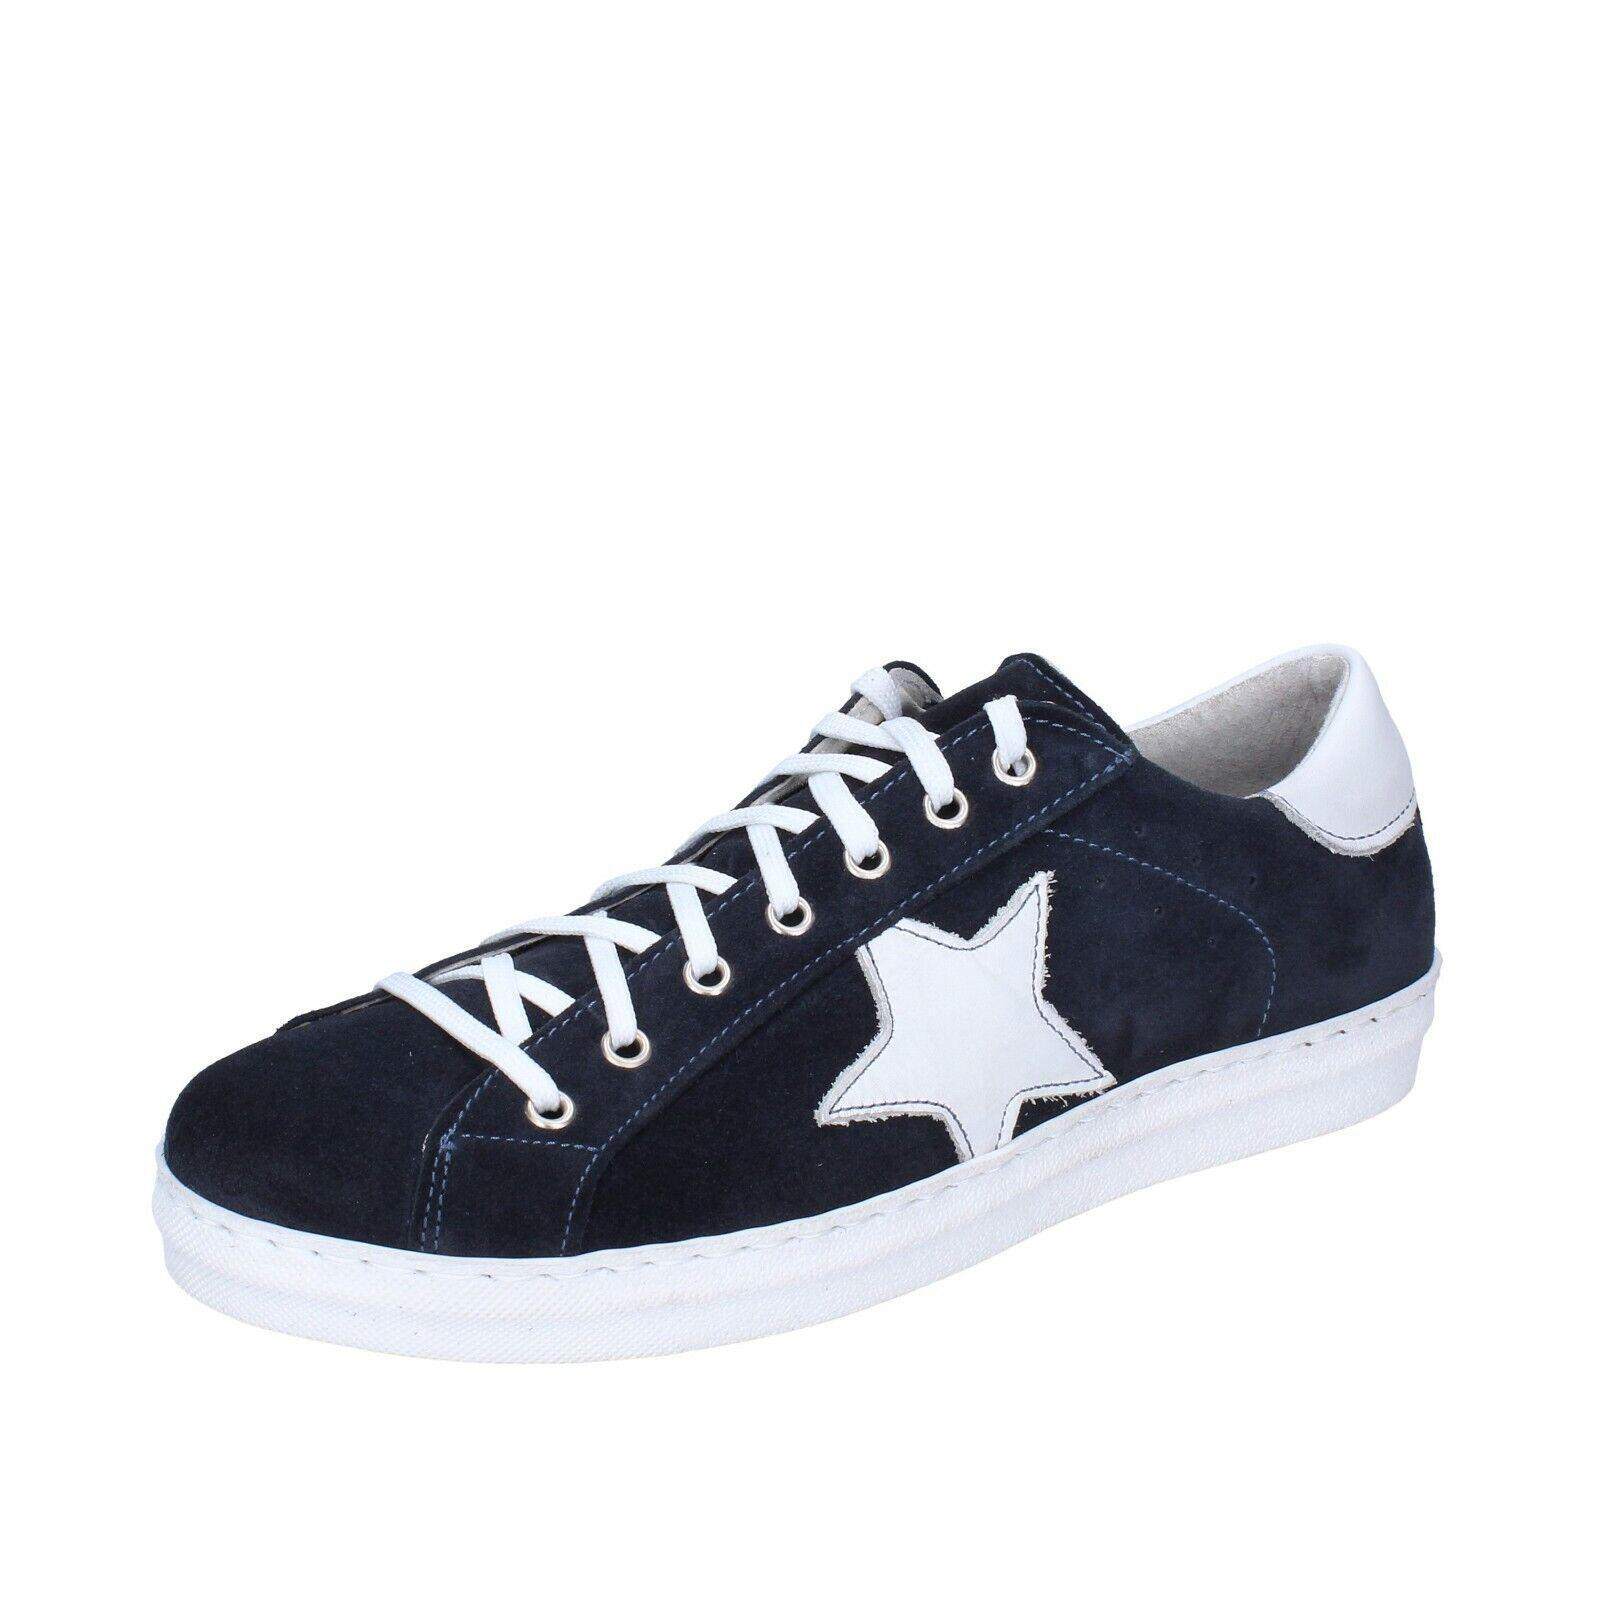 Men's shoes OSSIANI 8 (EU 42) sneakers blue suede BJ65-42